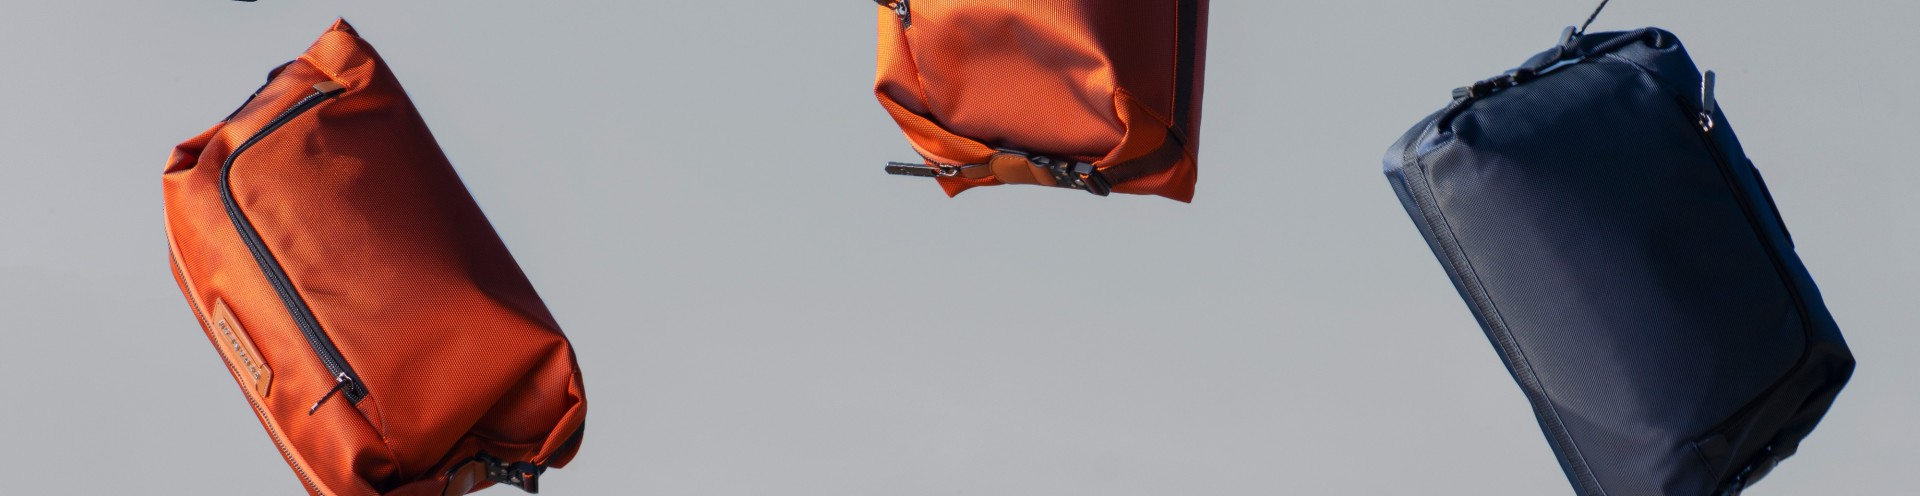 Bolsas de Aseo de Viaje para Hombre